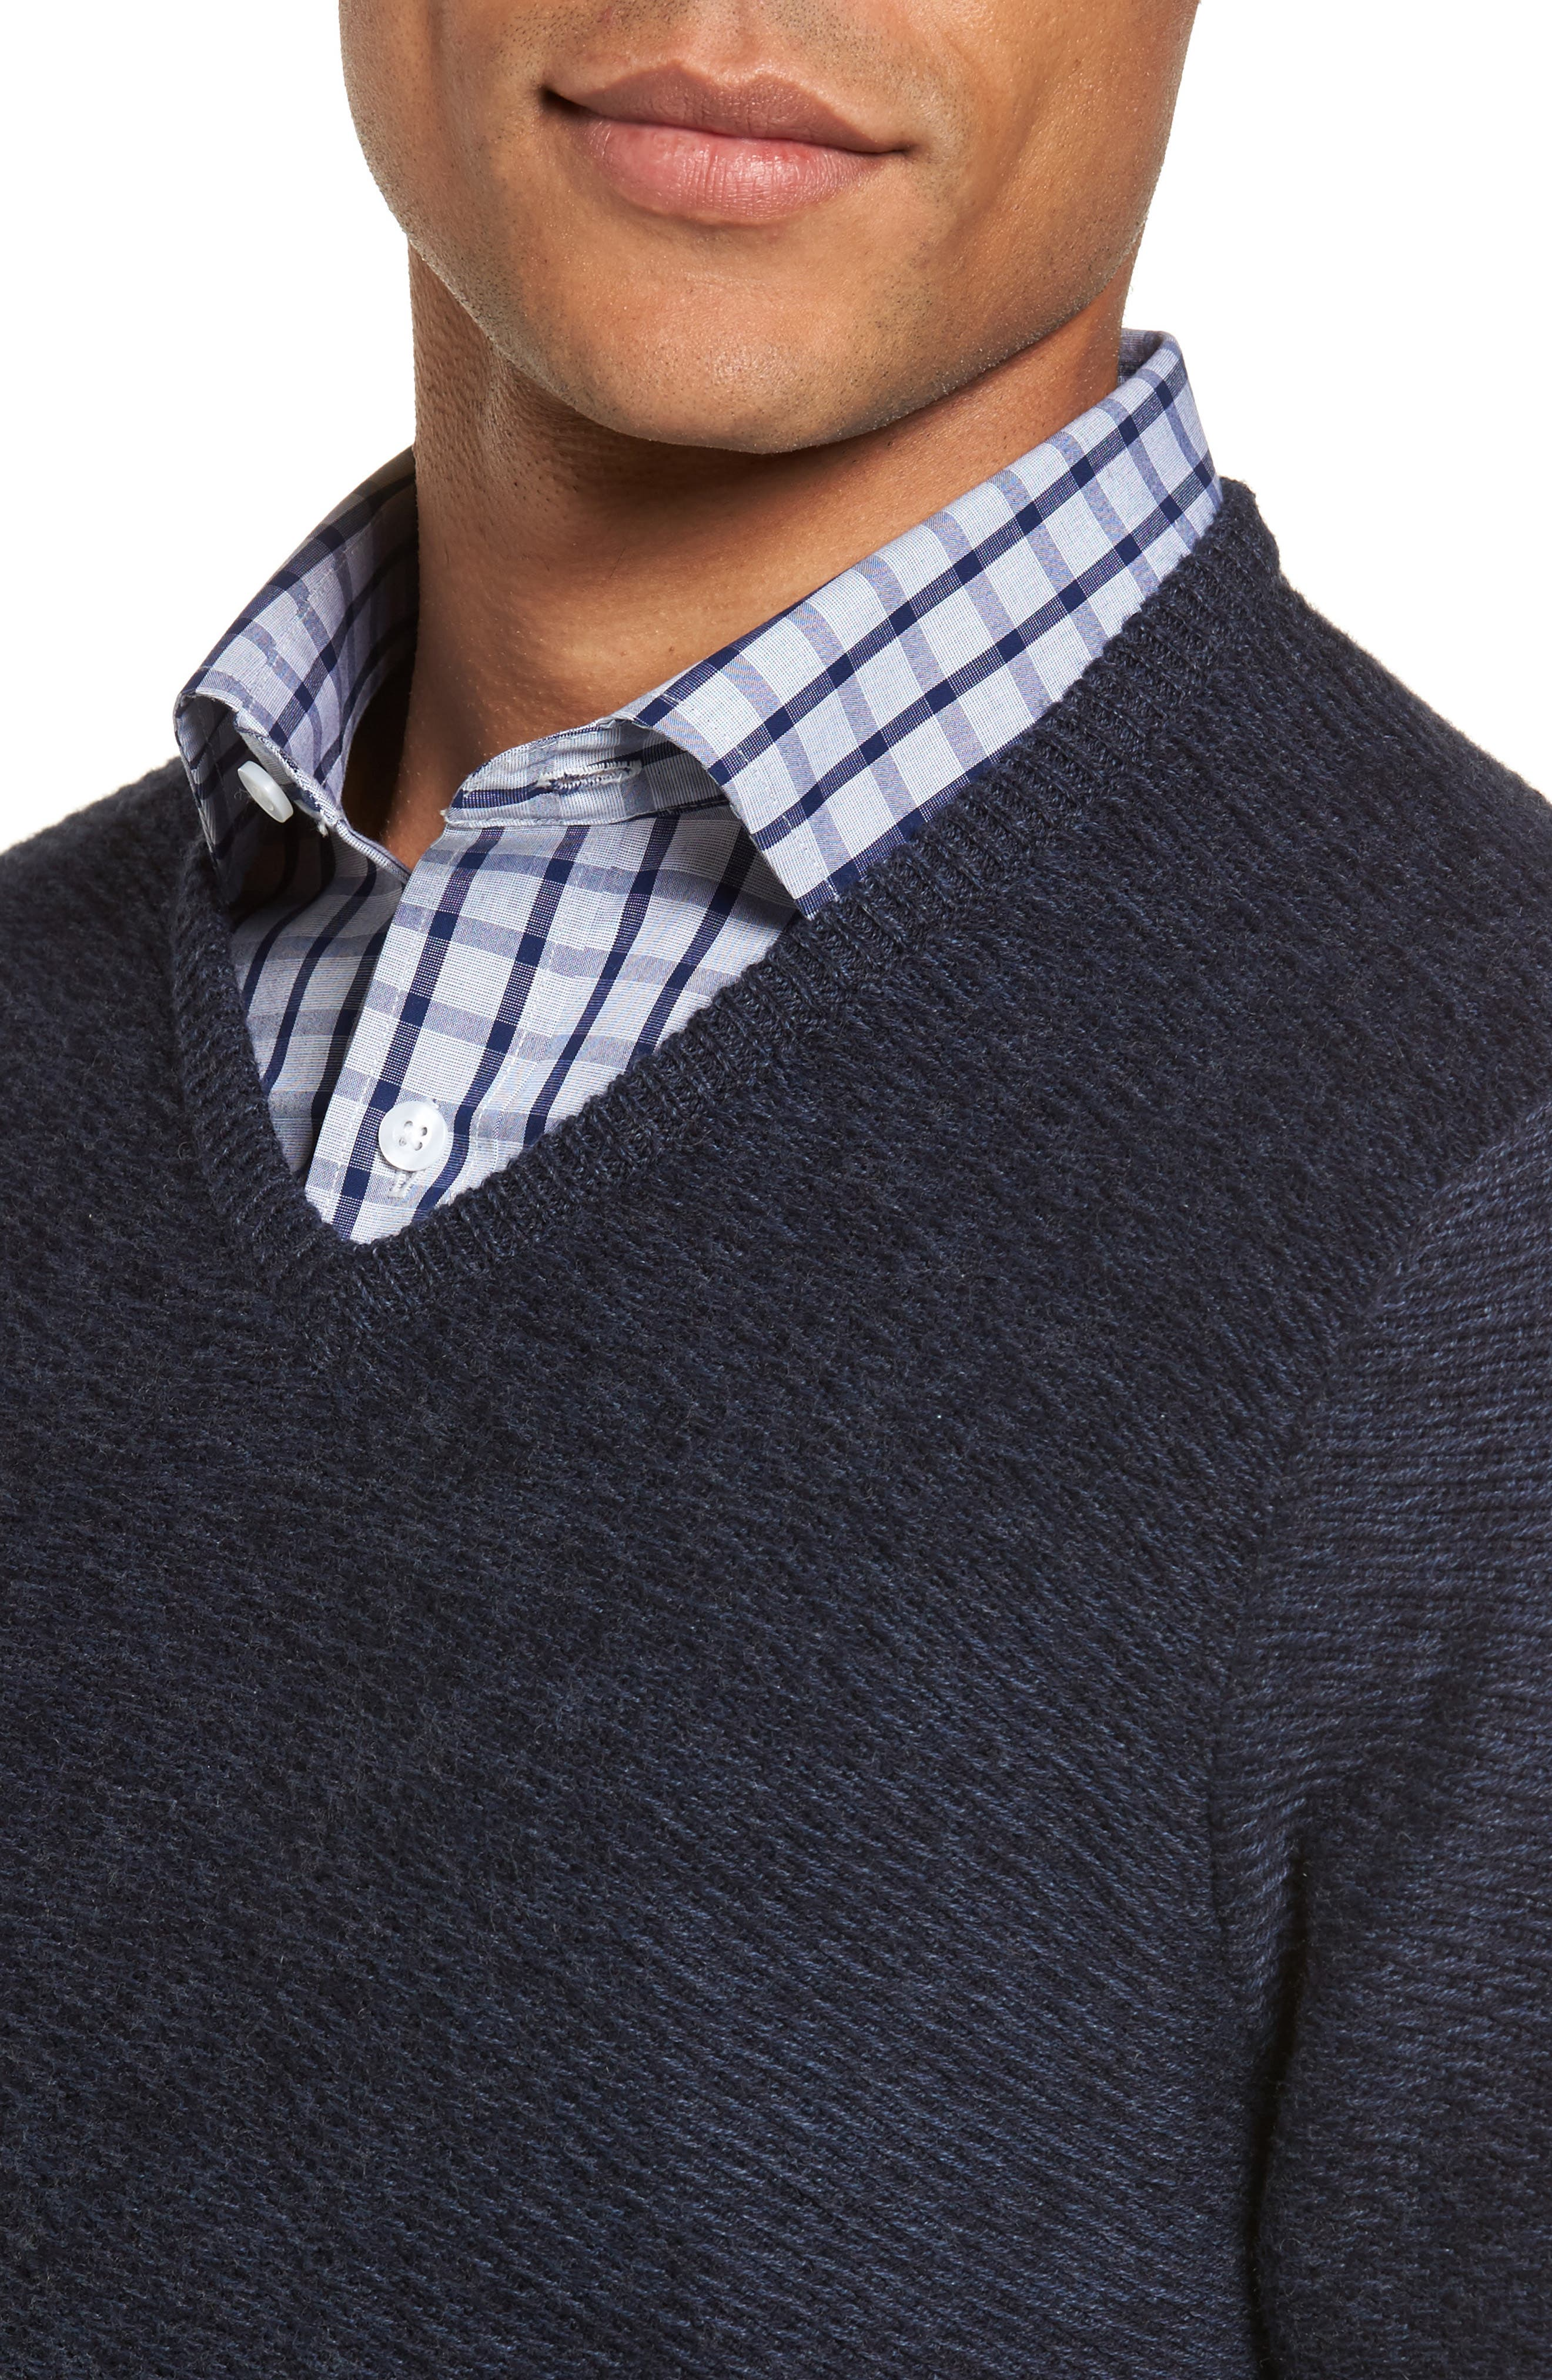 Cotton & Cashmere V-Neck Sweater,                             Alternate thumbnail 5, color,                             Navy Iris Melange